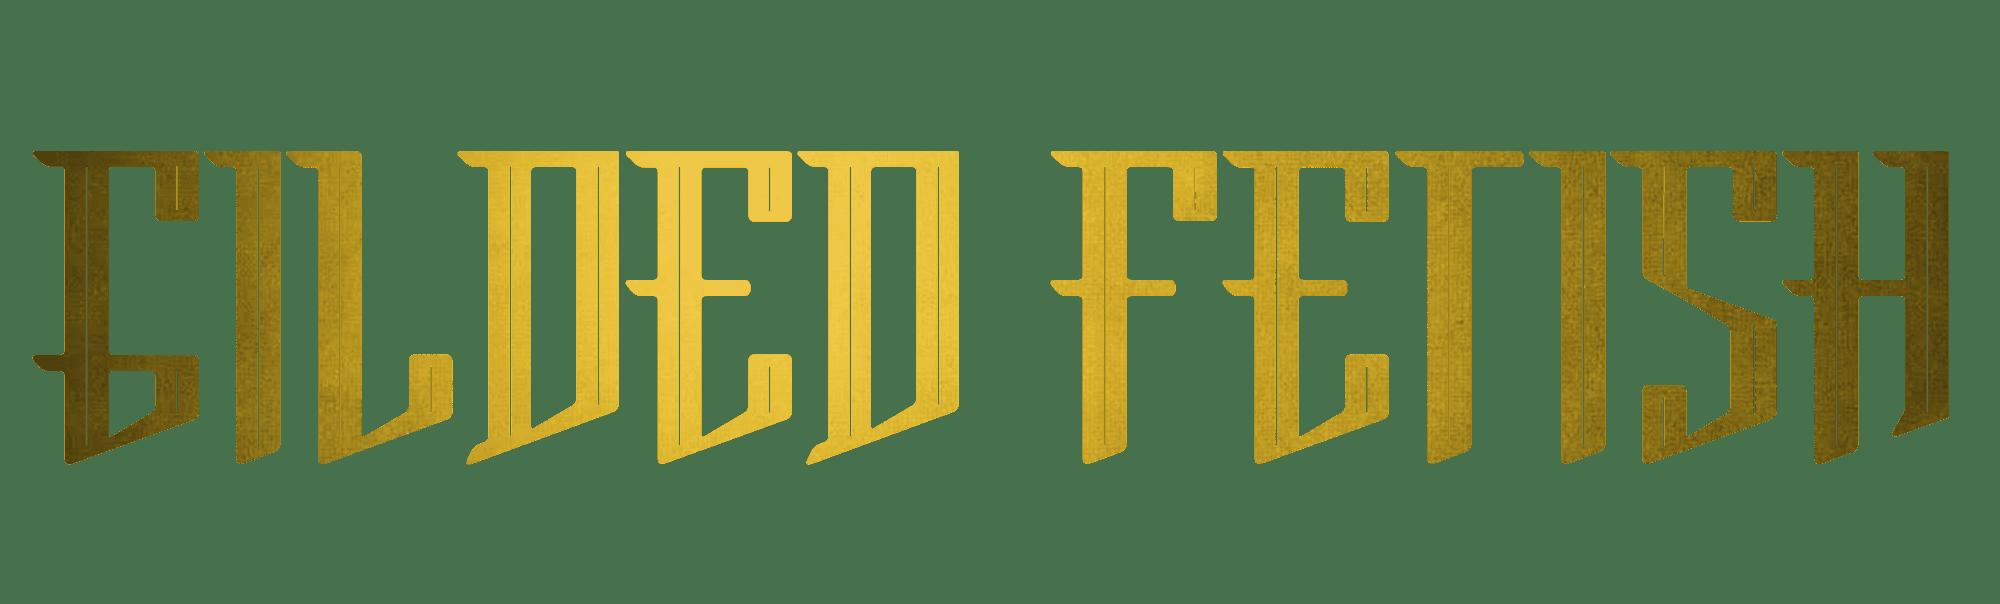 Gilded Fetish